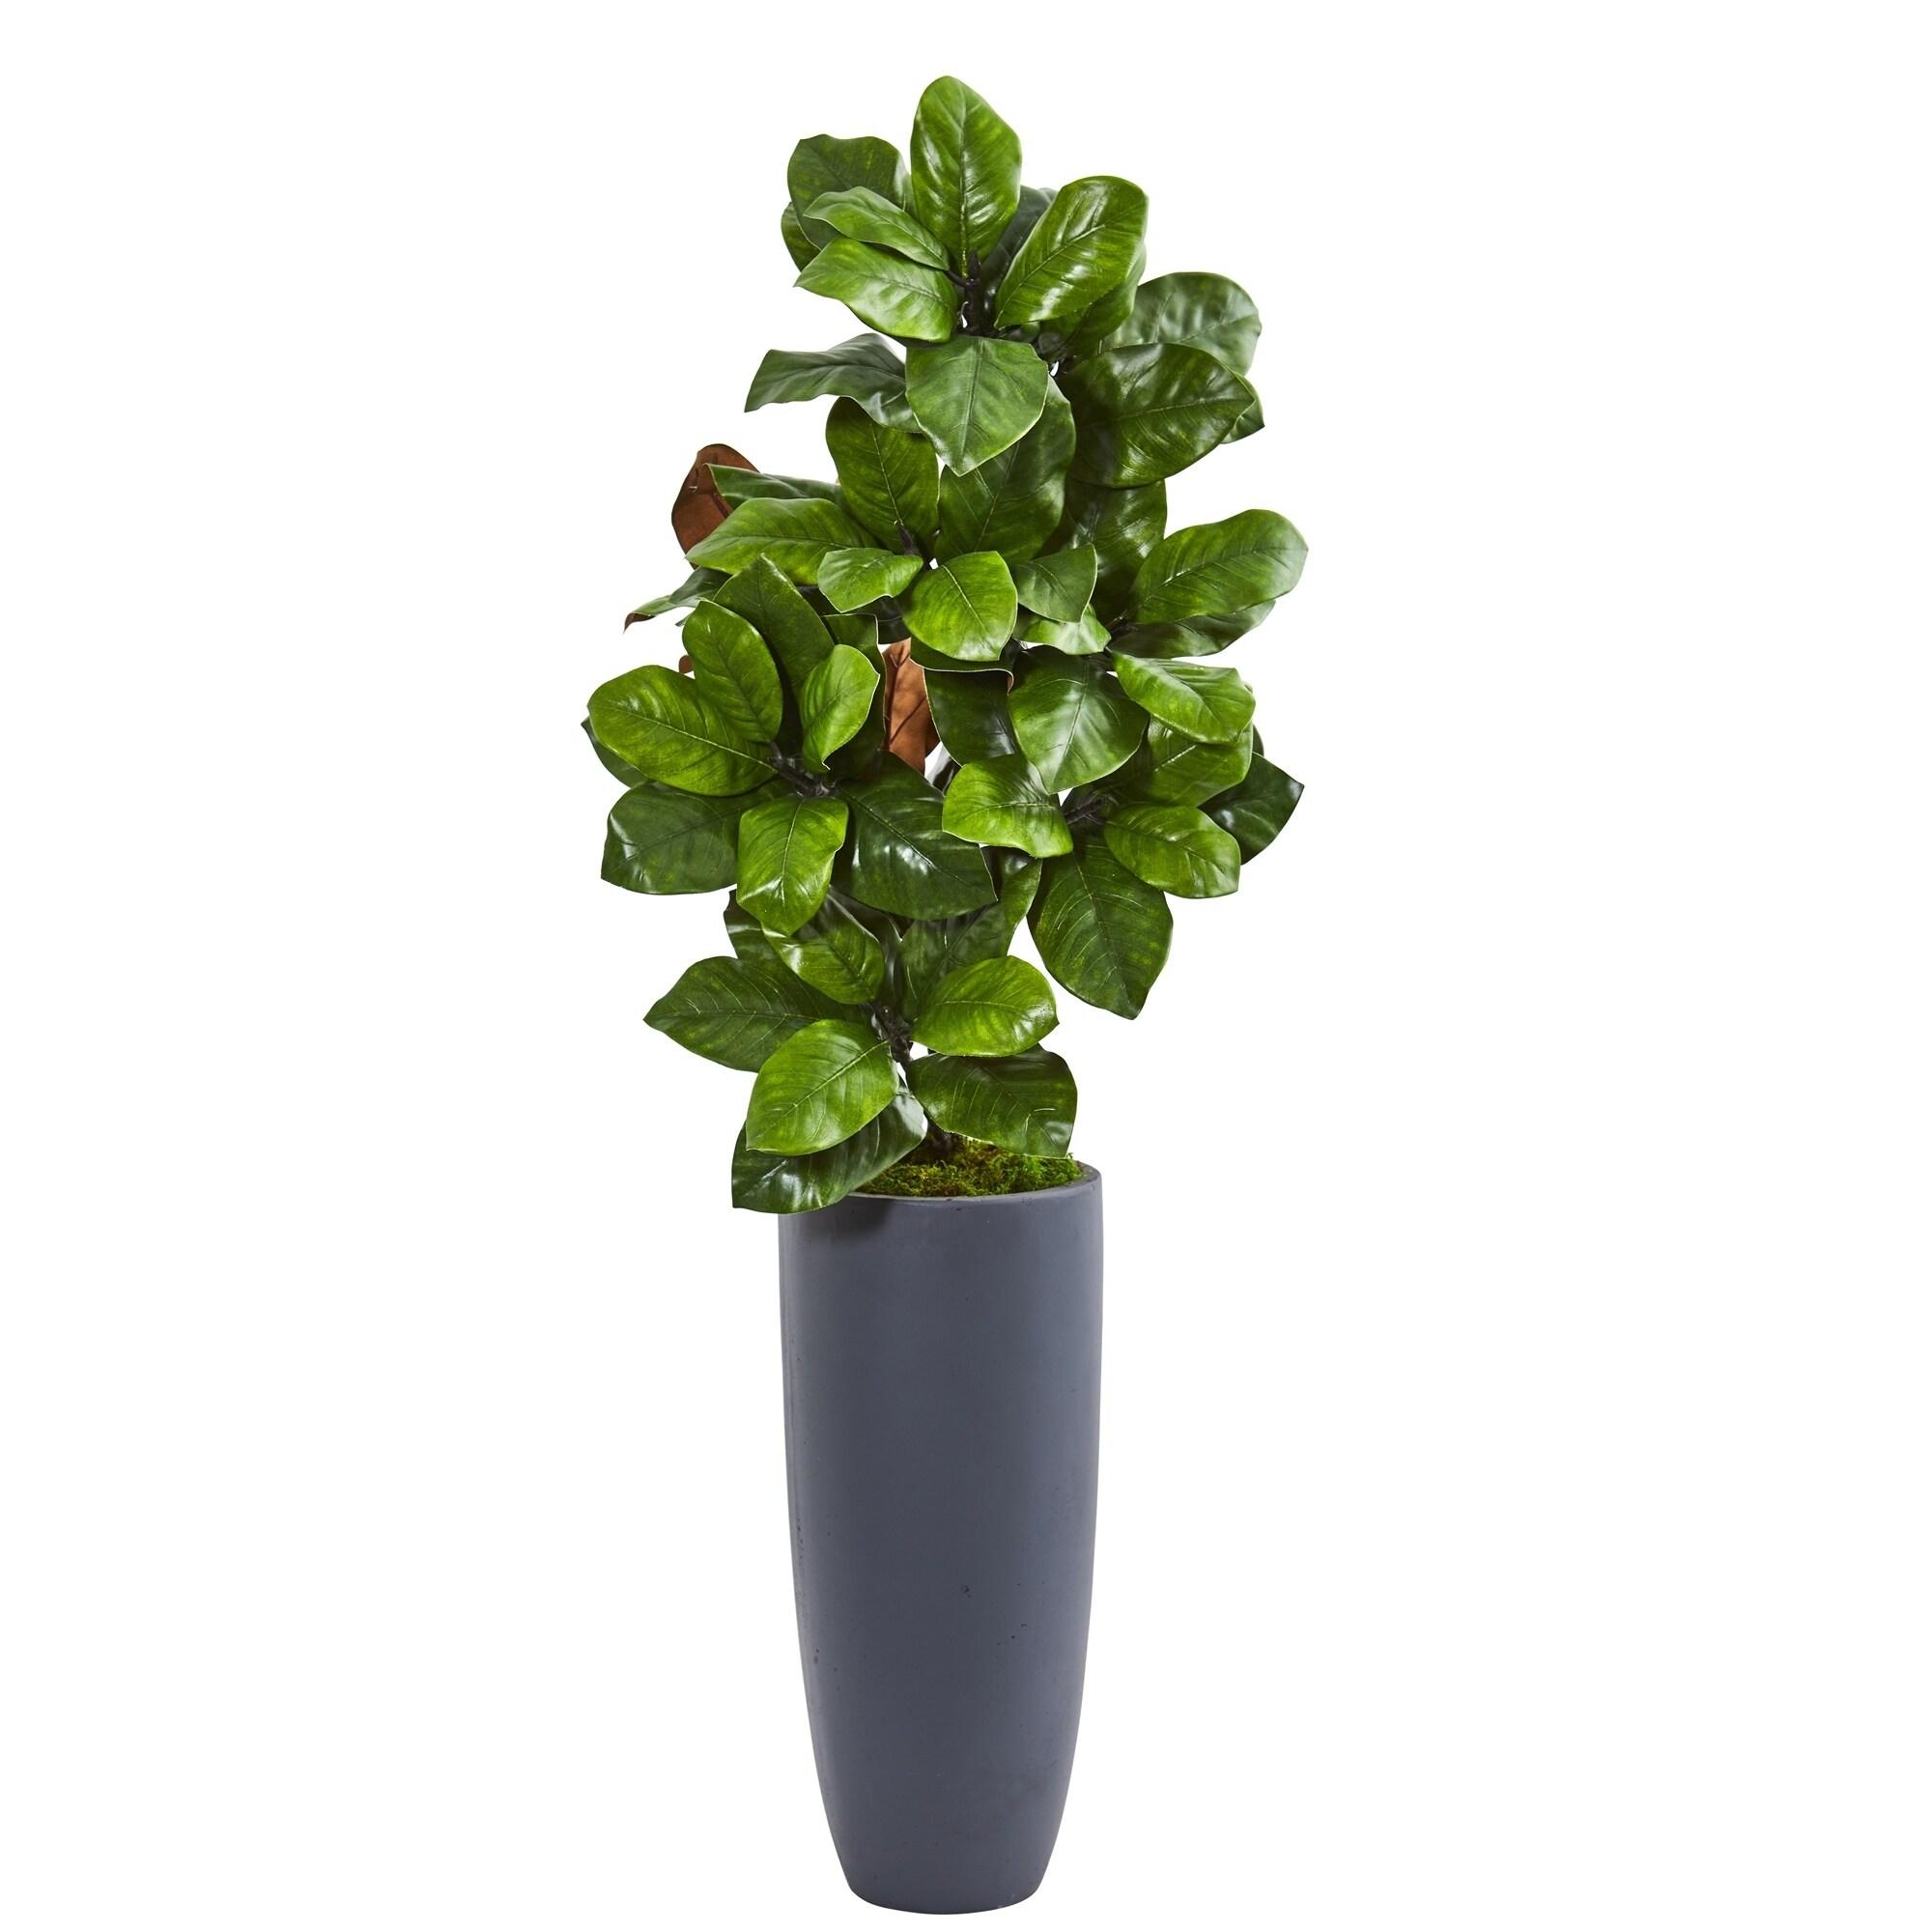 44 Magnolia Leaf Artificial Plant in Gray Planter